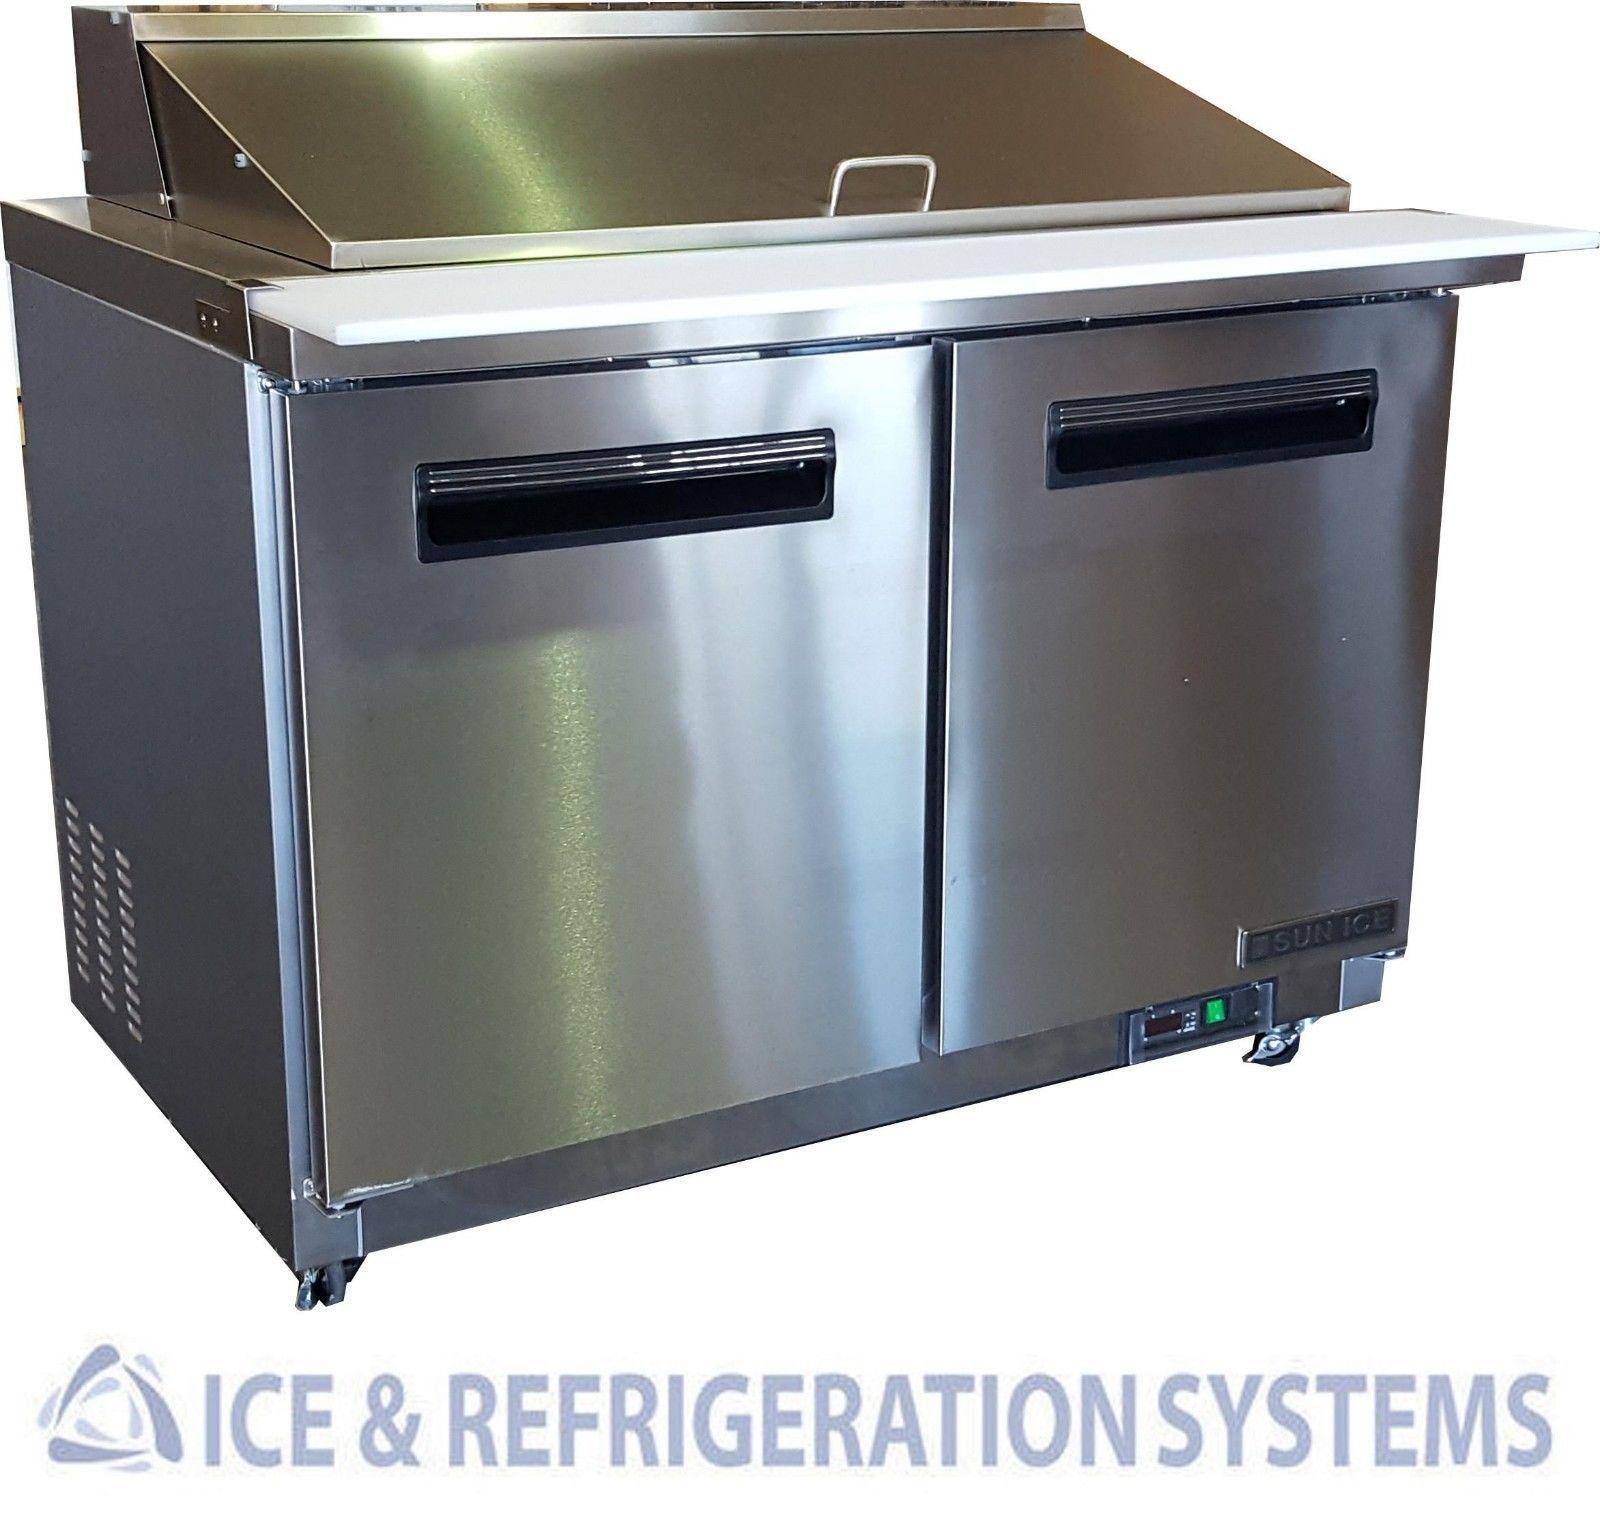 SUN ICE COMMERCIAL SALAD SANDWICH MEGA TOP PREP TABLE COOLER - Sandwich prep table cooler